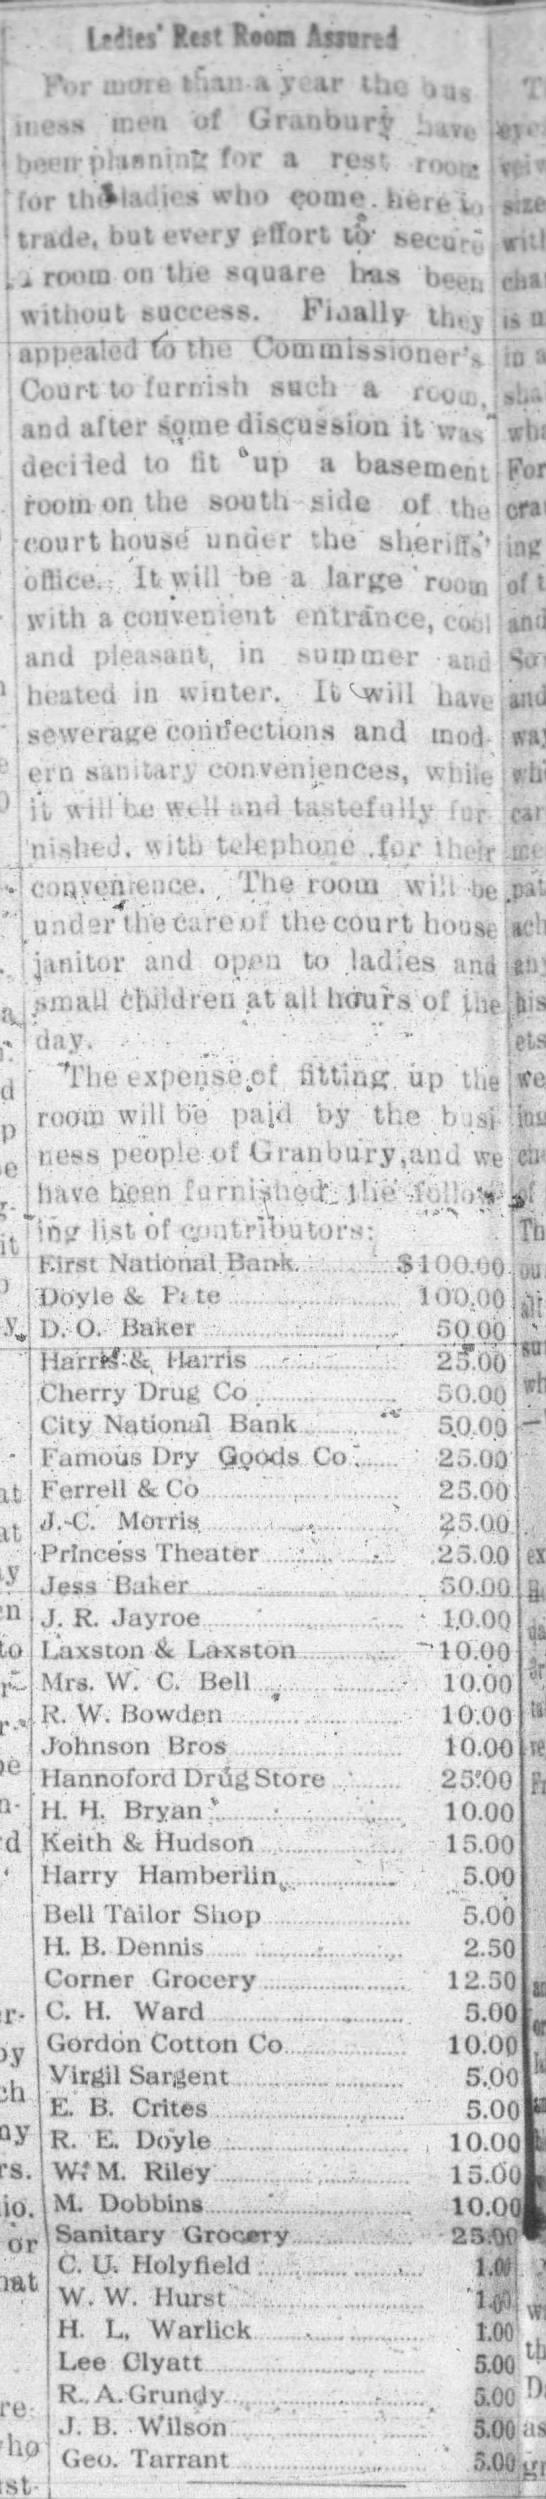 1920 ladies rm at cthouse businesses in Gbury - . l?':fs' t.ul Foora Ajwrsl 1 Vr u.-!- u.-!-...